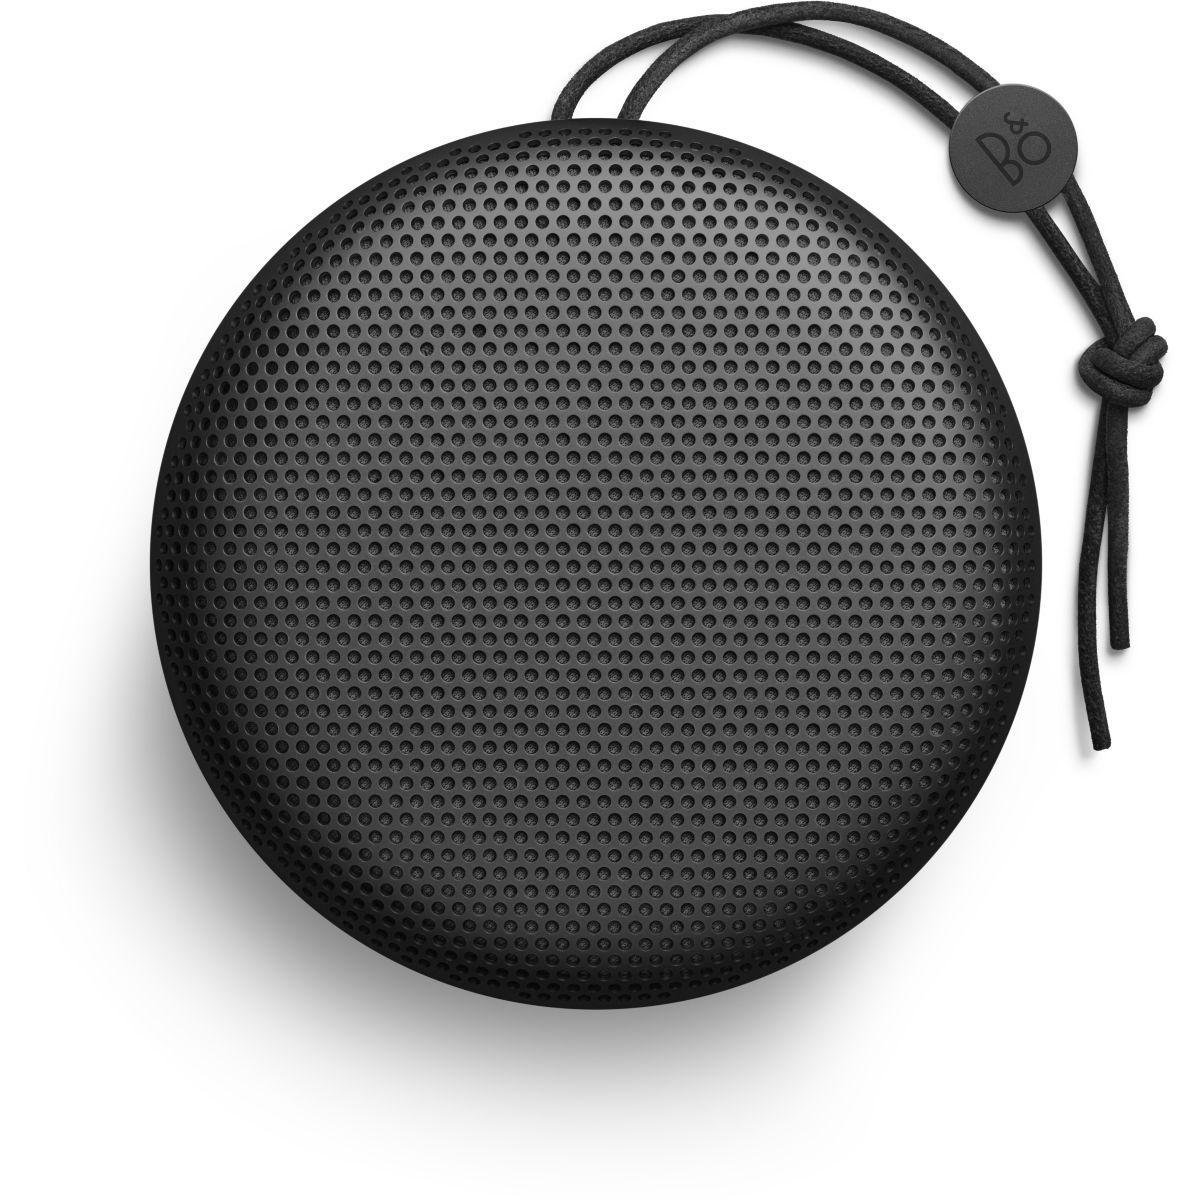 Enceinte bluetooth bang et olufsen beoplay a1 noir - livraison offerte : code premium (photo)